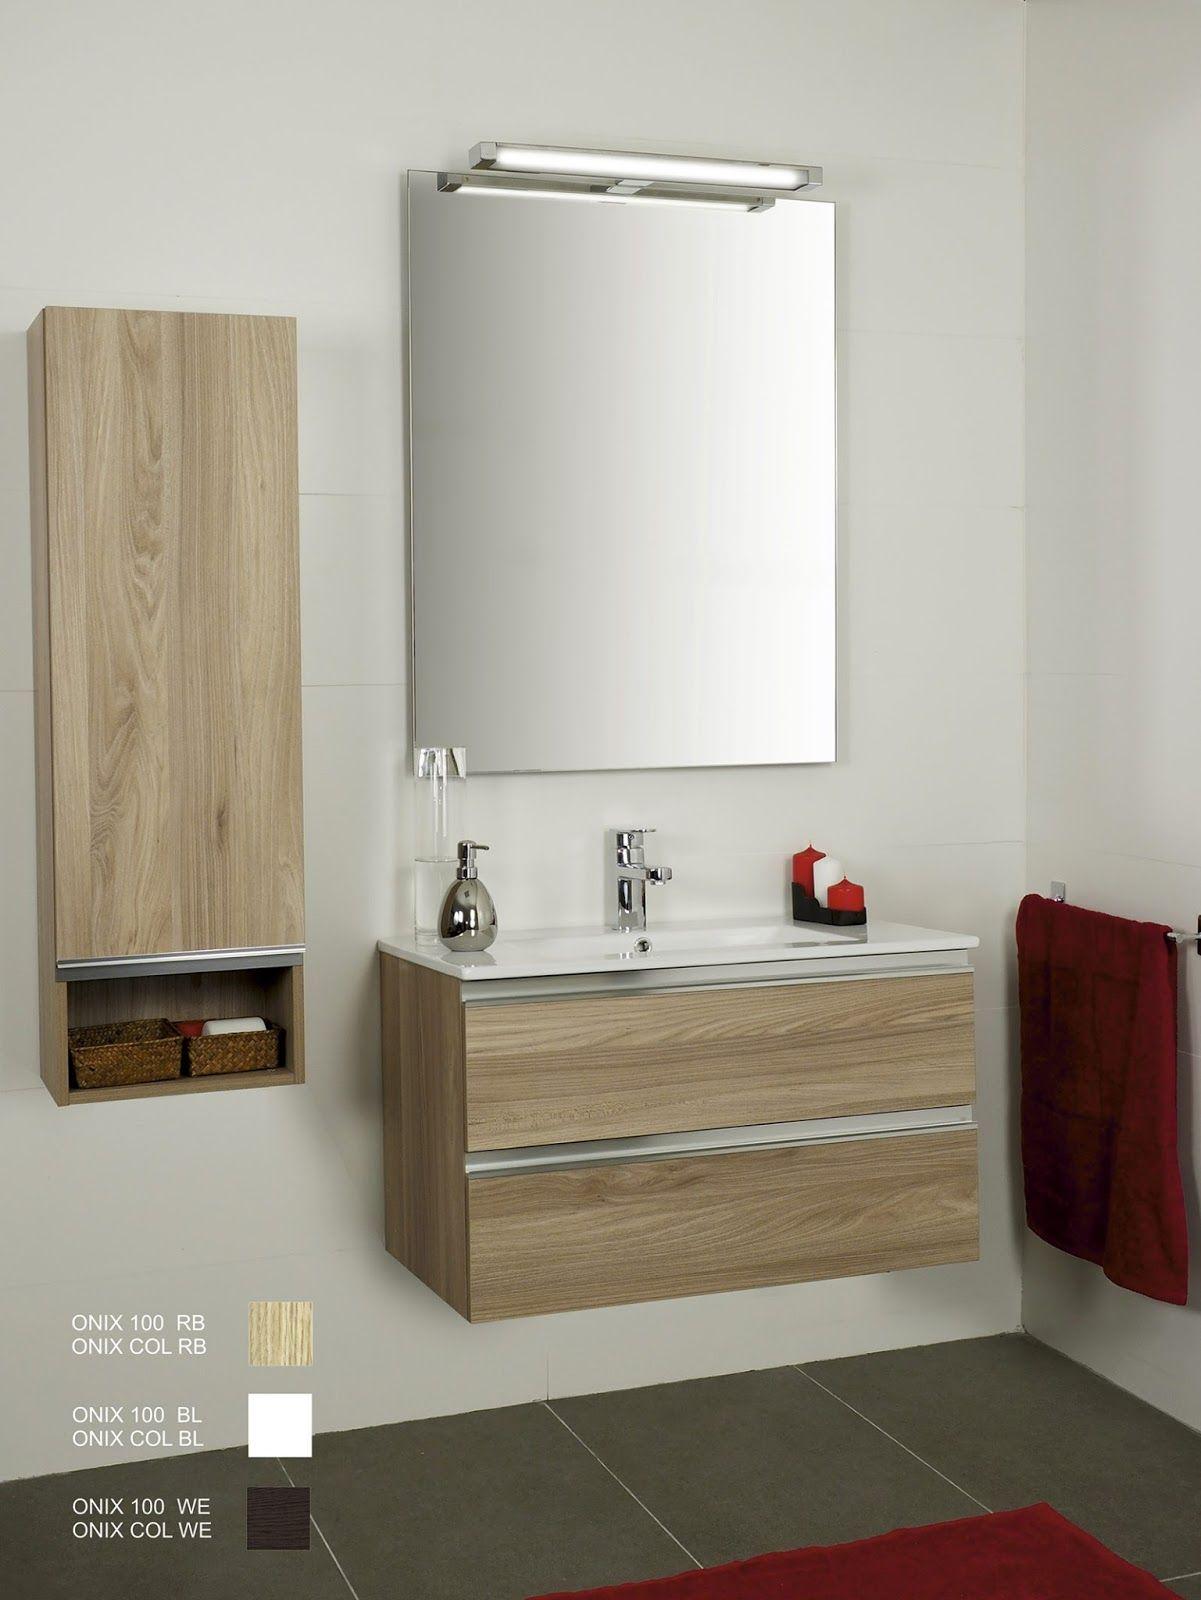 Mueble de ba o incluye lavabo oferta muebles de ba o de dise o pinterest small bathroom - Lavabo de bano ...